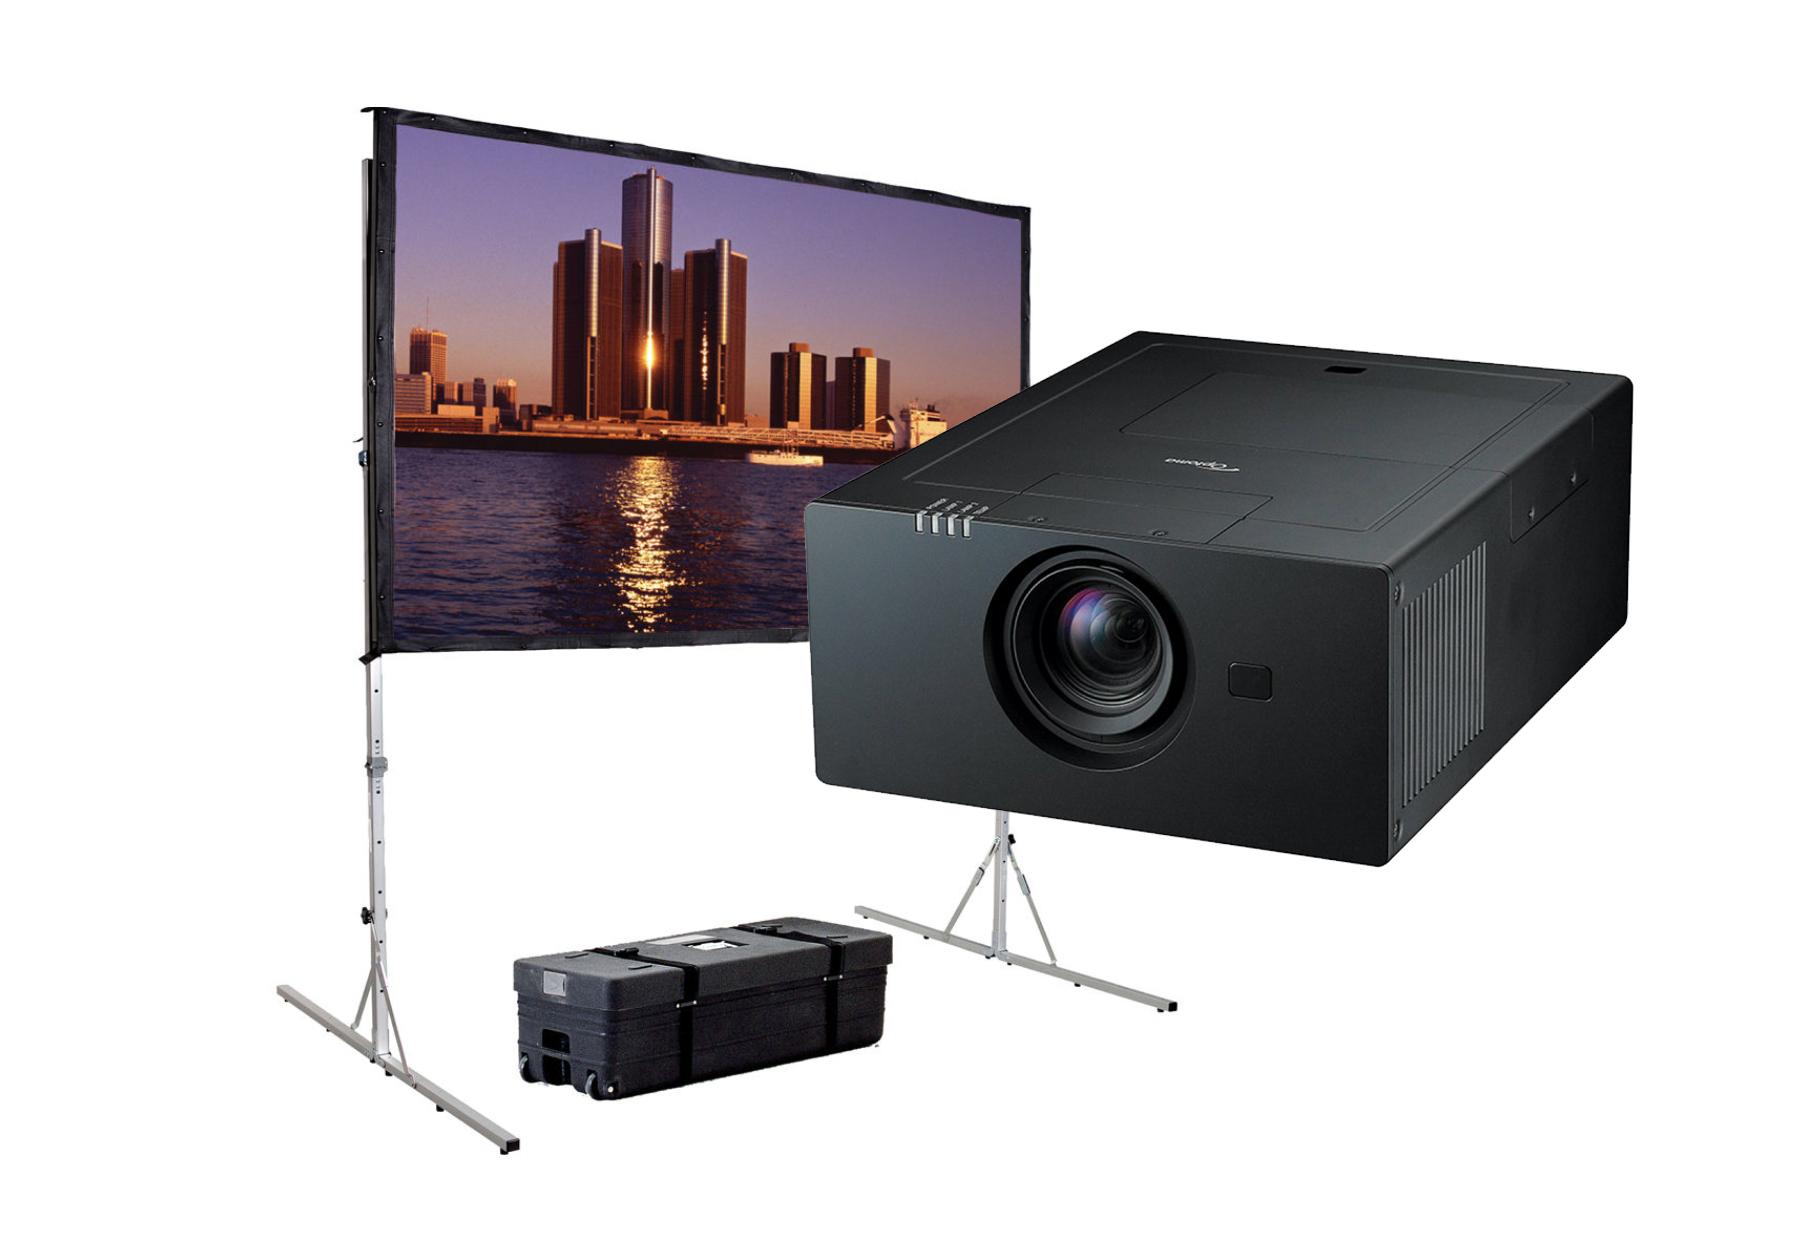 Hire AV equipment, projectors, projector screens, fastfold screens in Cardiff, Swansea, Newport, Carmarthenshire, Pembrokeshire, South & West Wales